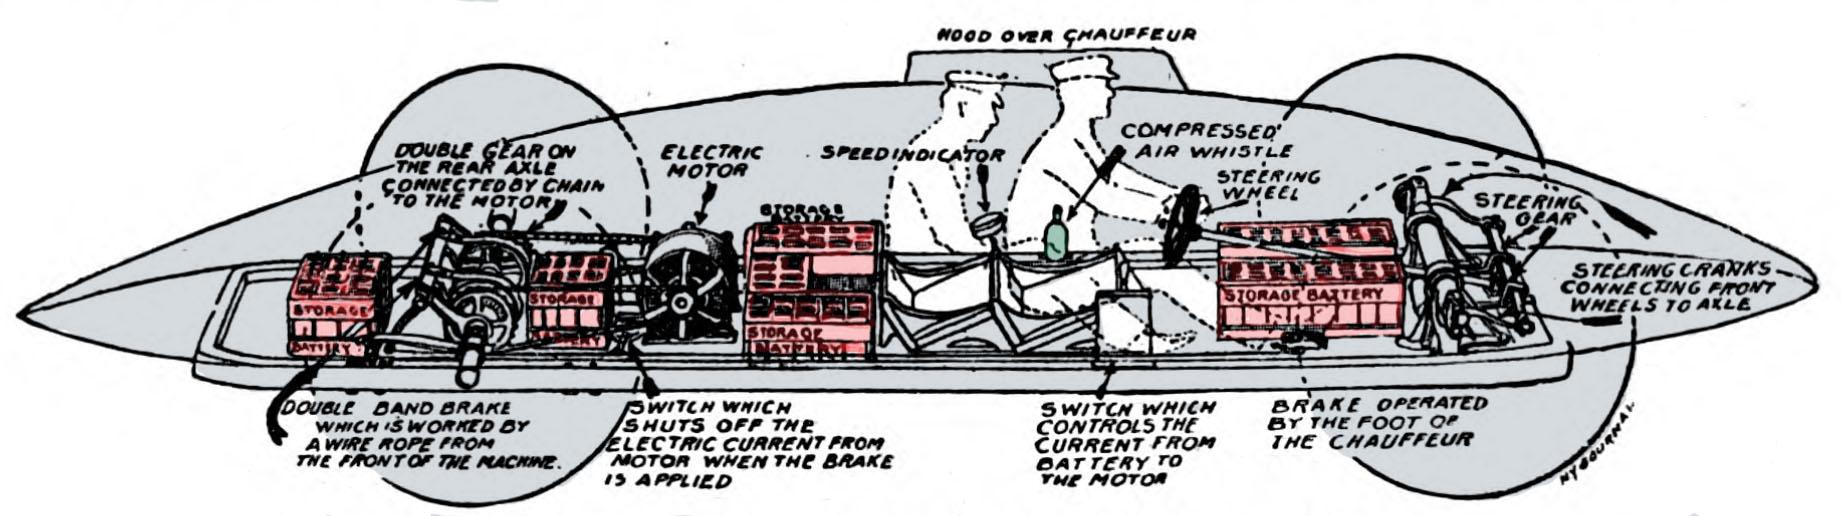 1902 06 05 Motor World 290 Baker Torpedo 2 a.jpg